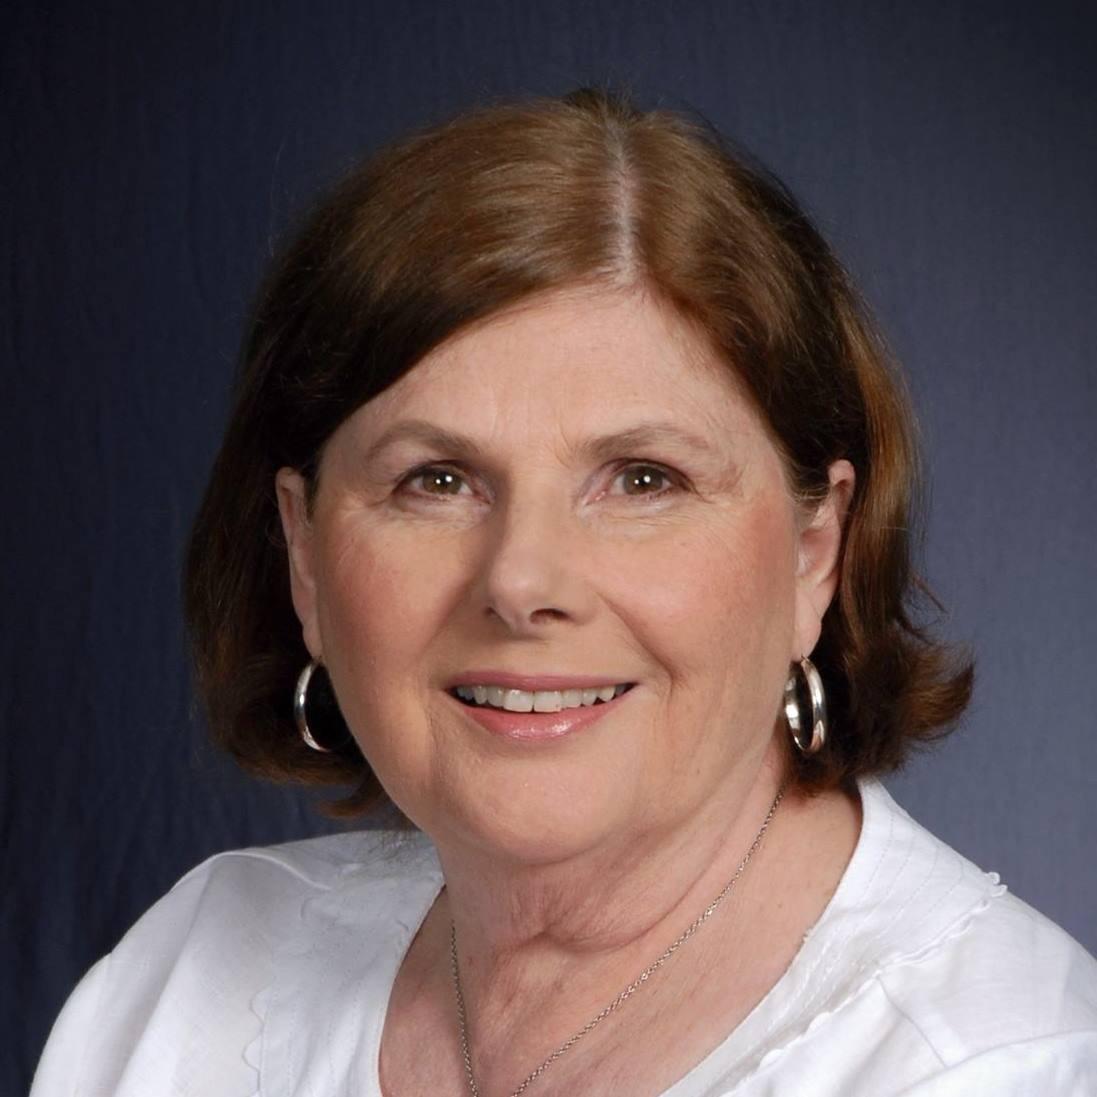 Linda Banasiak